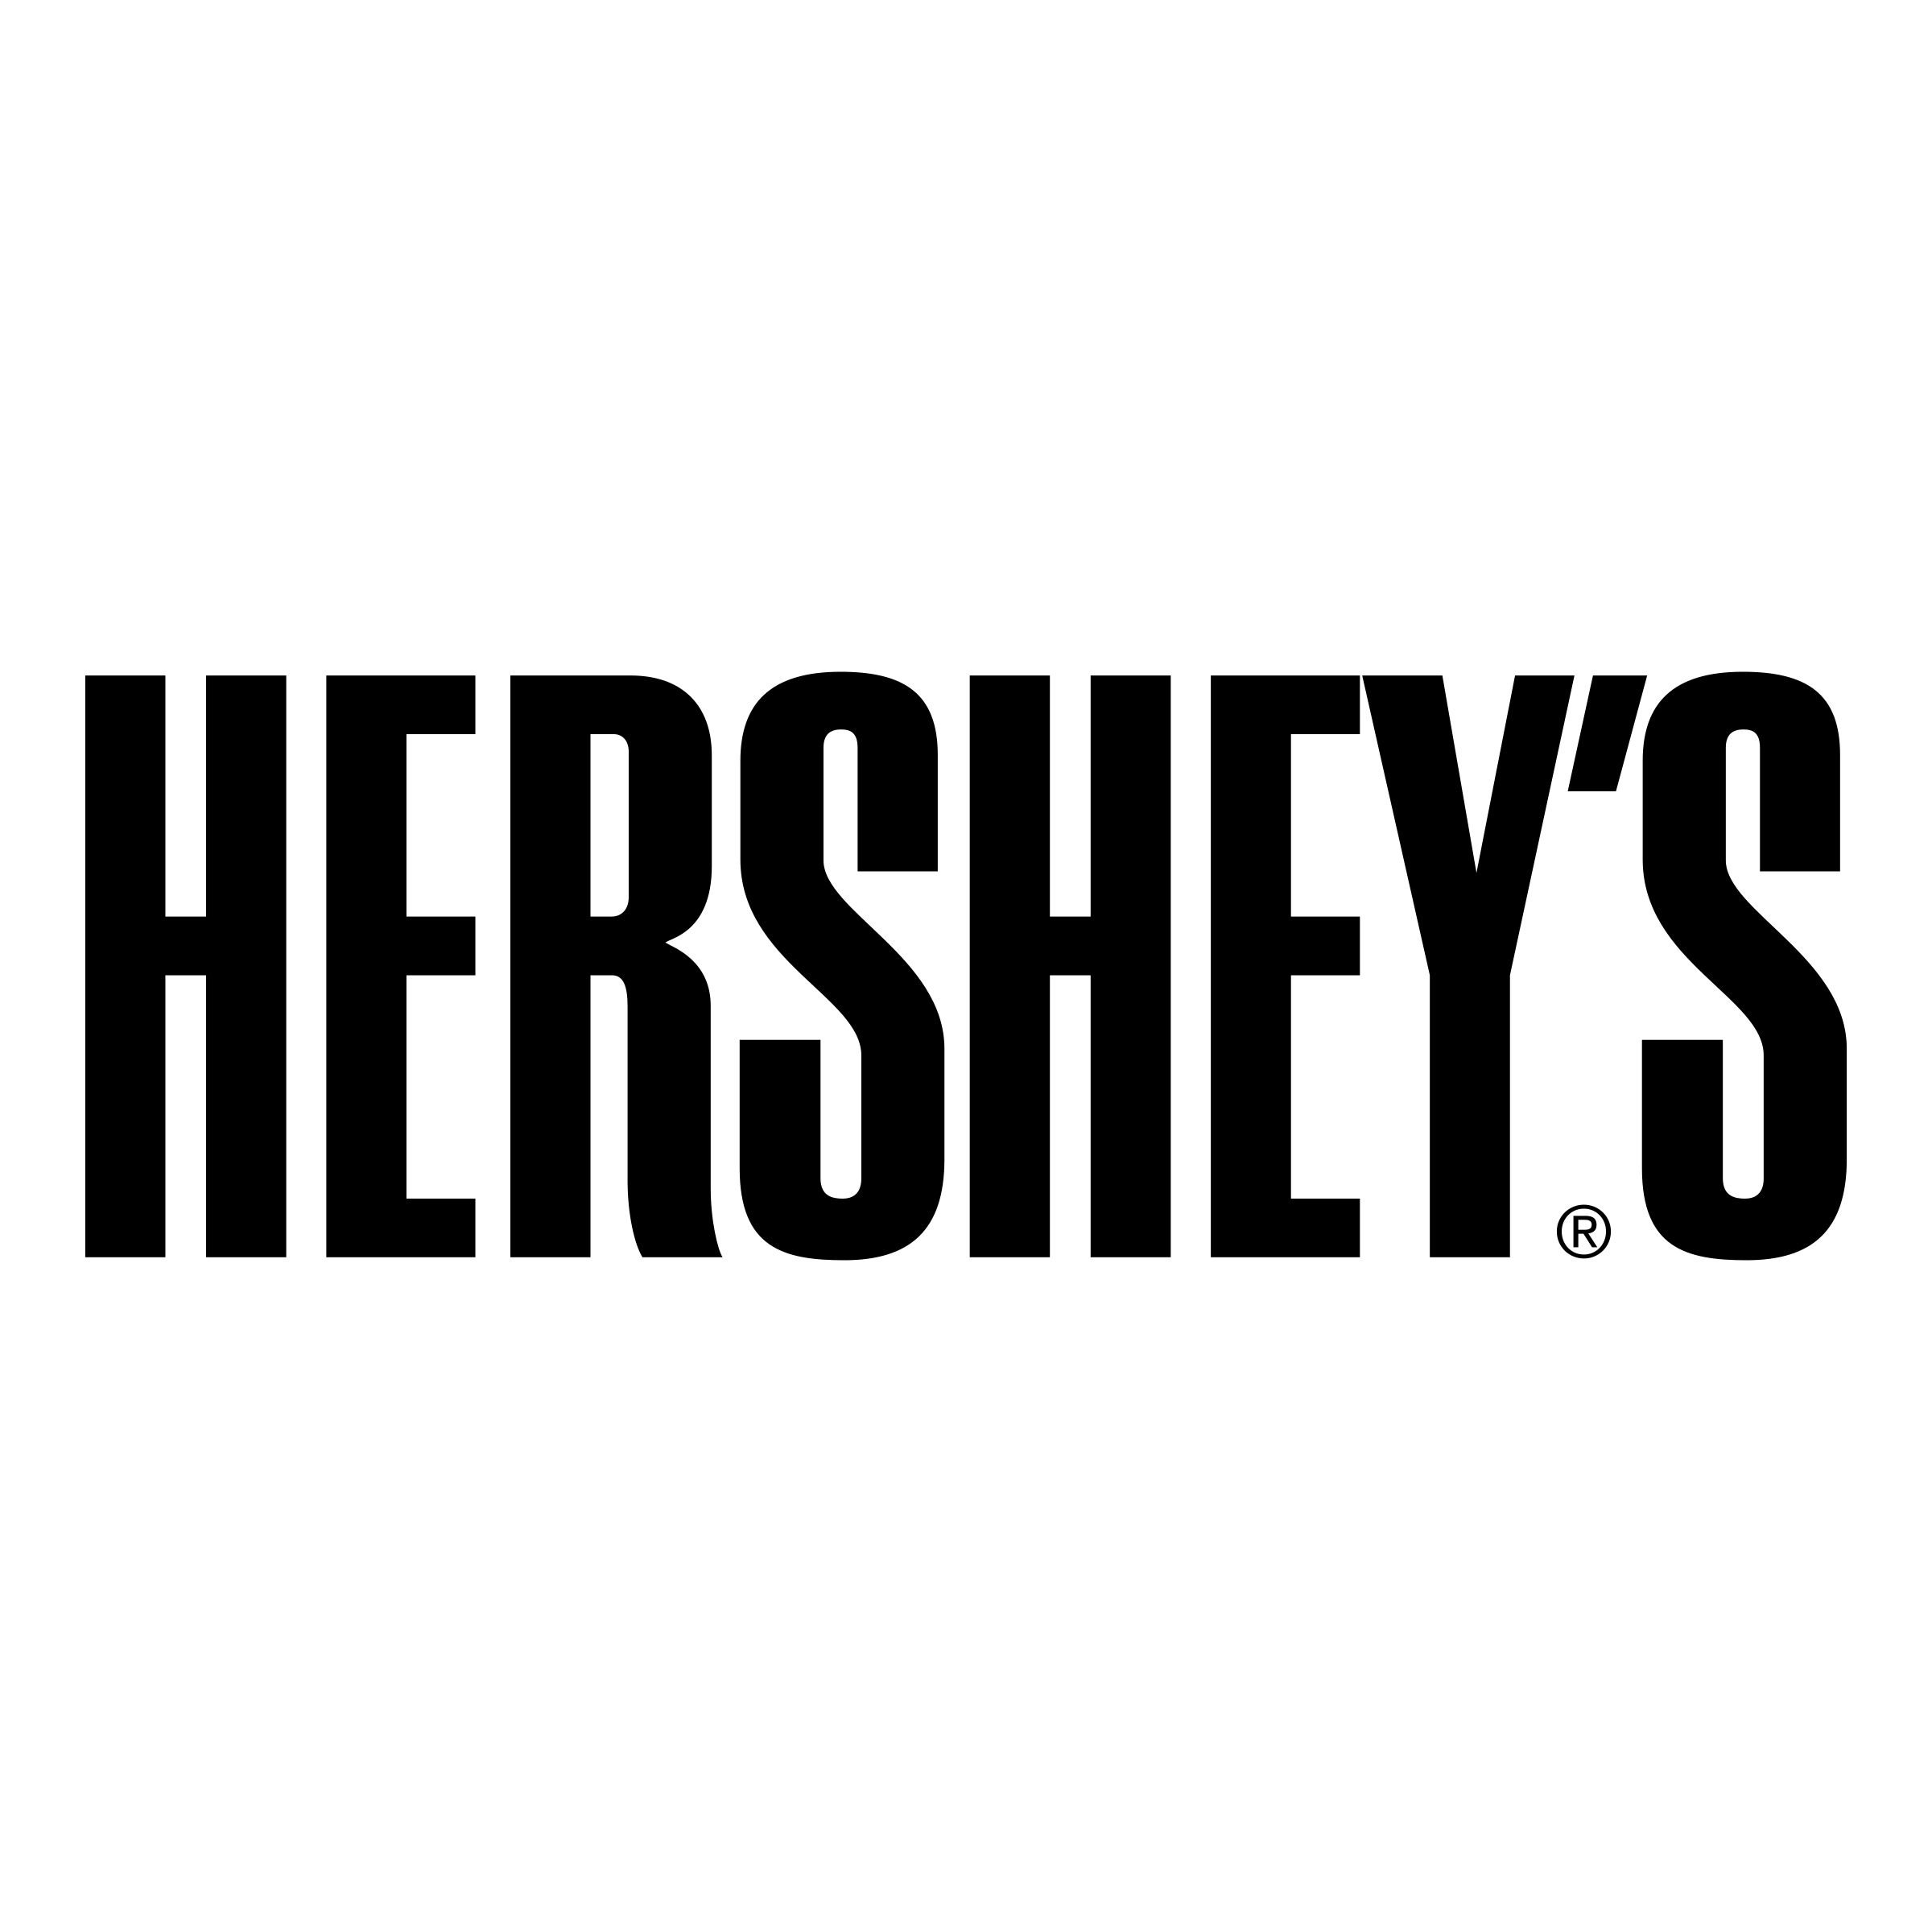 hersheys-logo-black-and-white